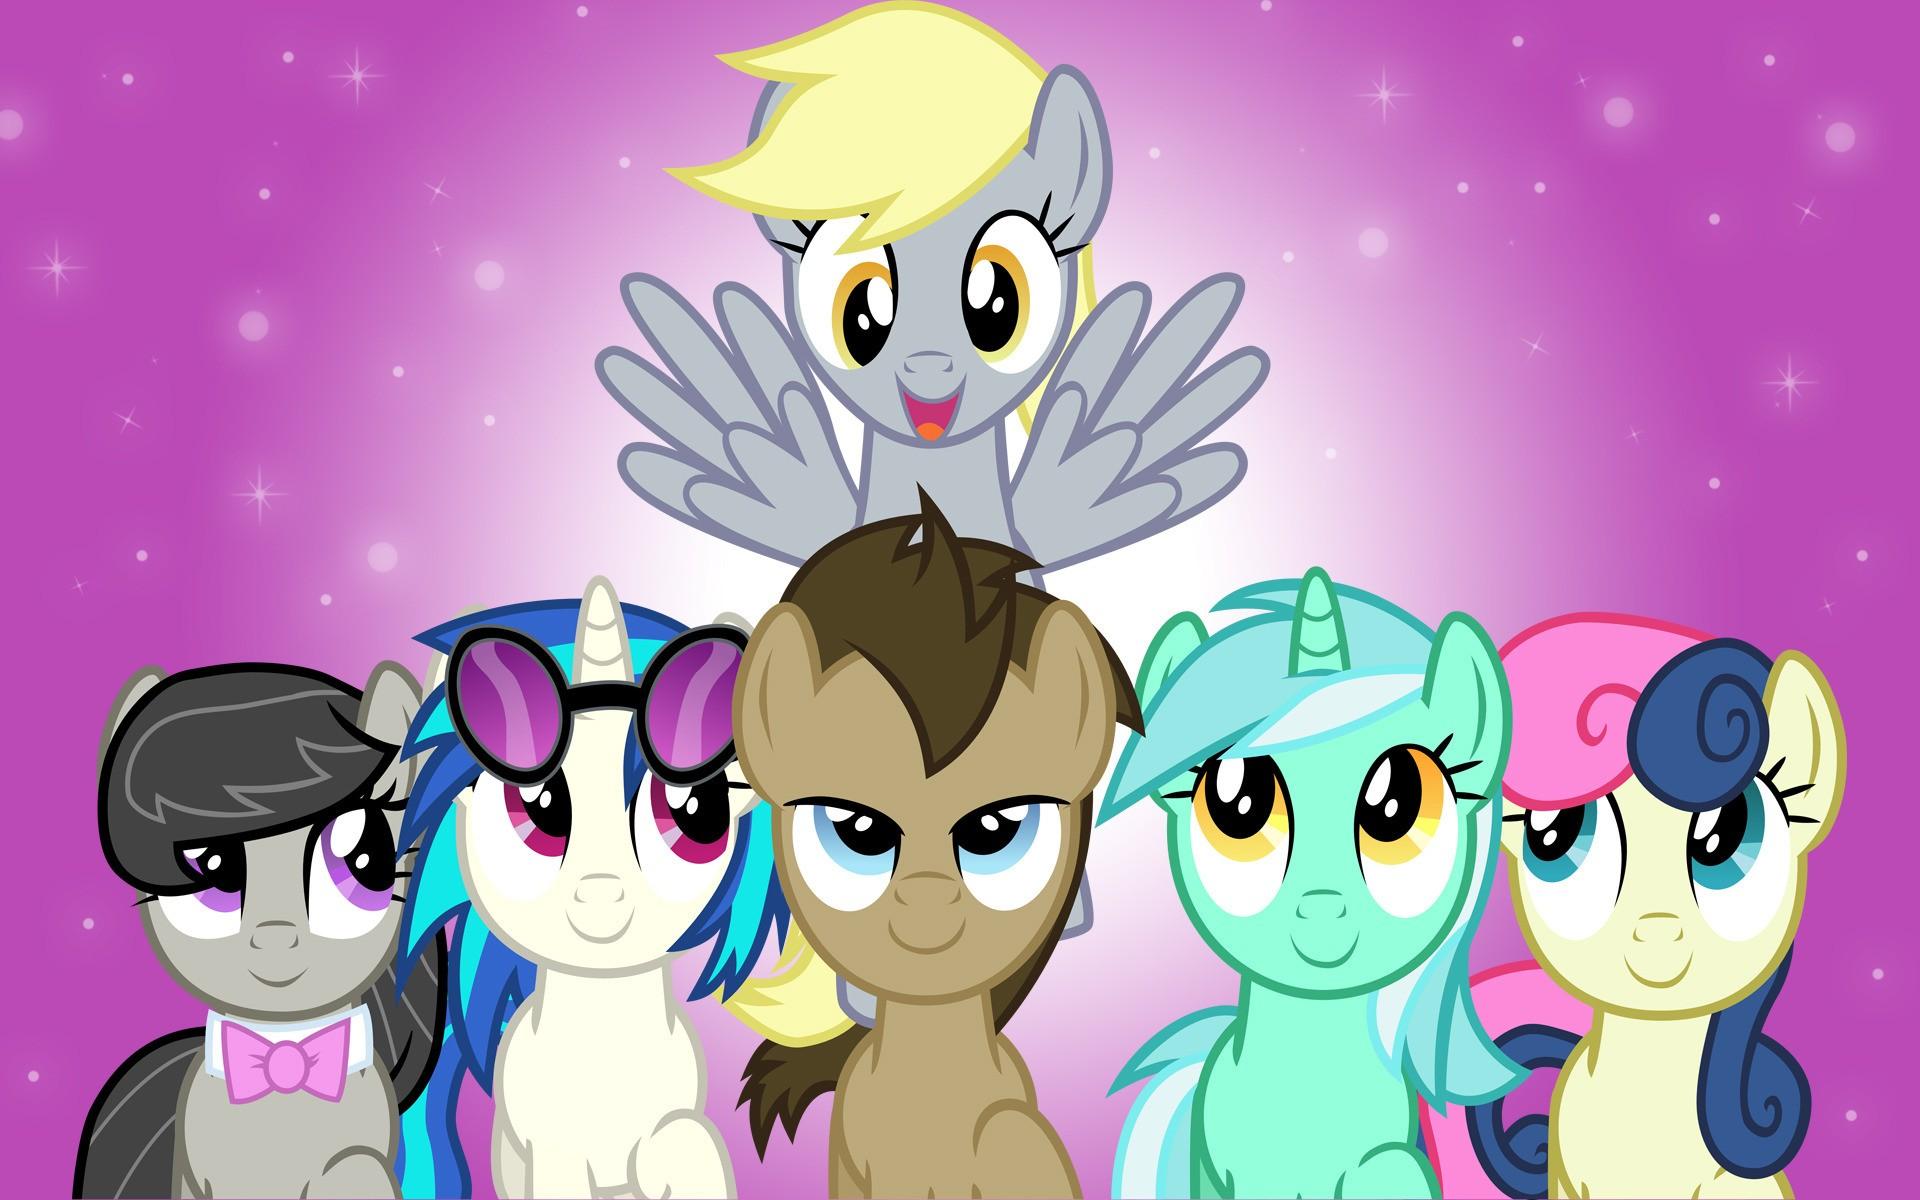 Mlp Background Ponies 183 ① Download Free Stunning